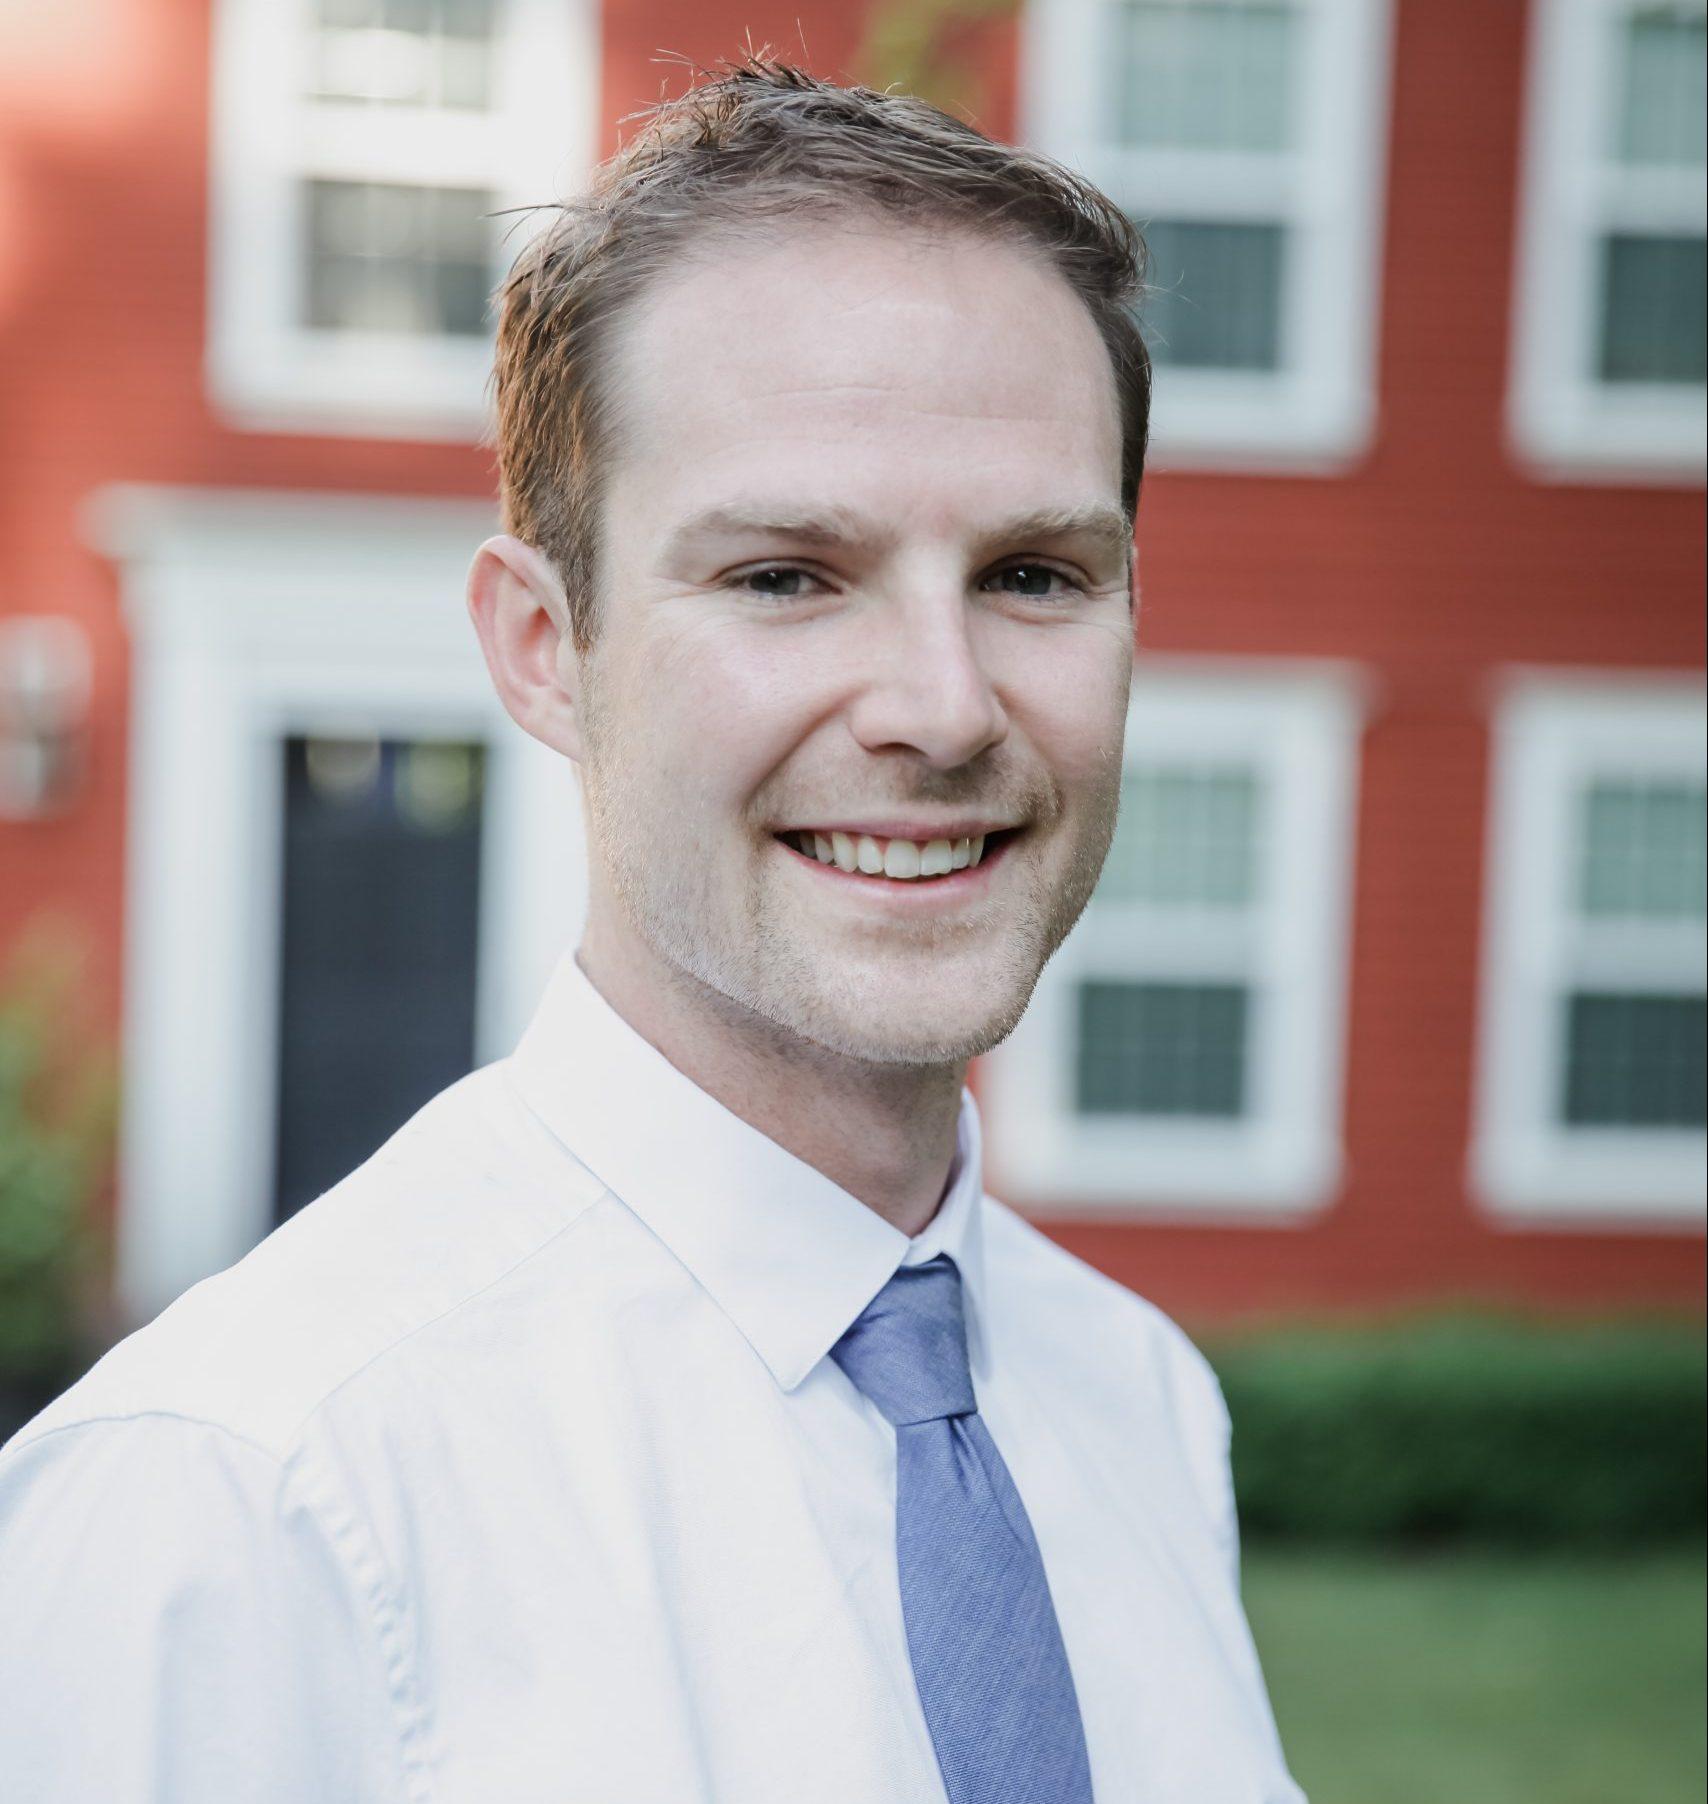 Matthew Sheeks Digital Marketing Specialist Hellomedio